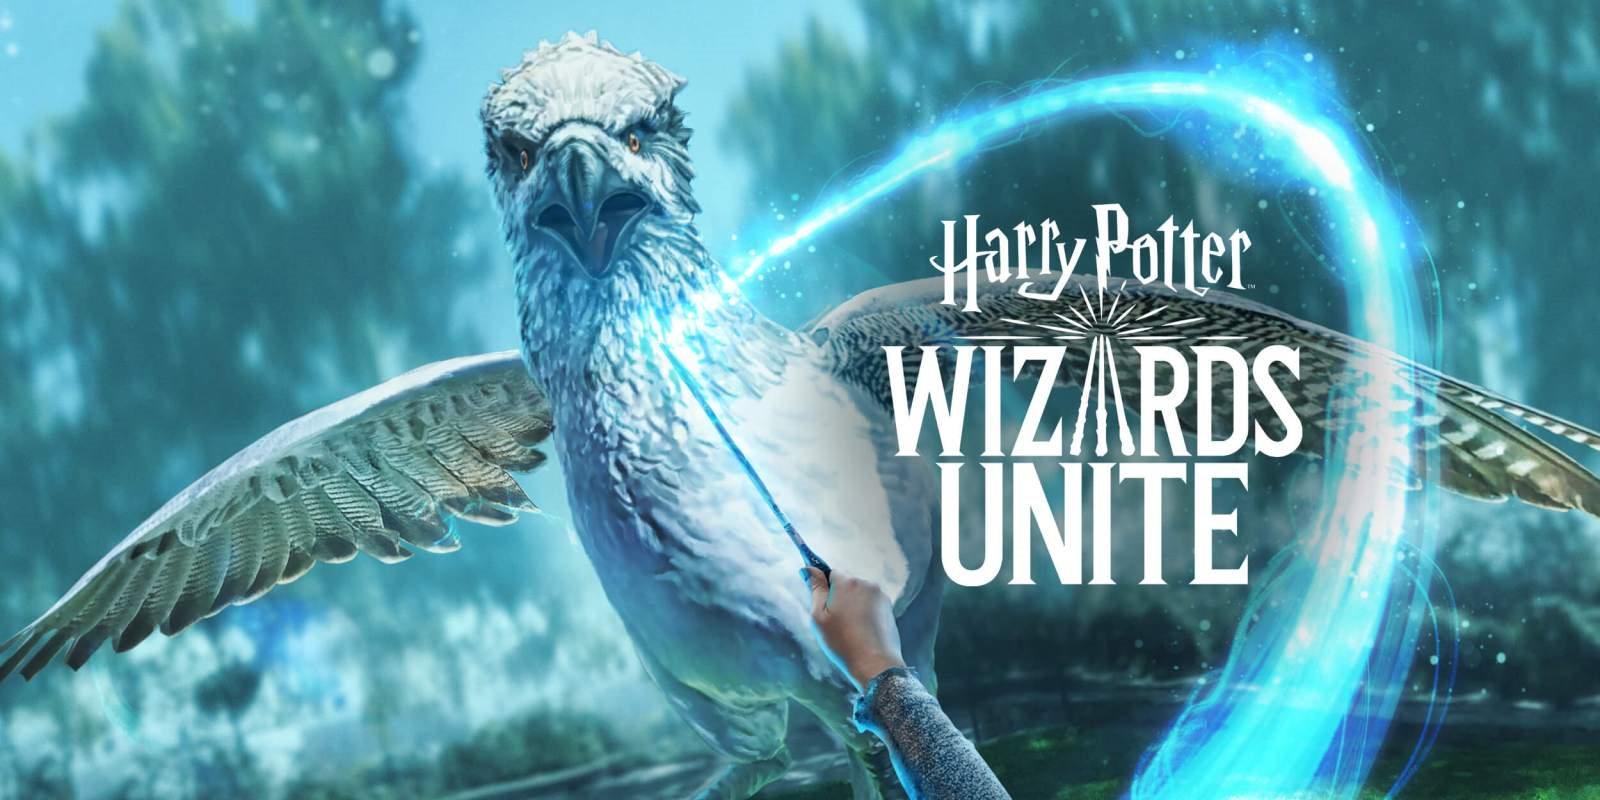 Harry Potter: Wizards Unite; wallpaper, cover